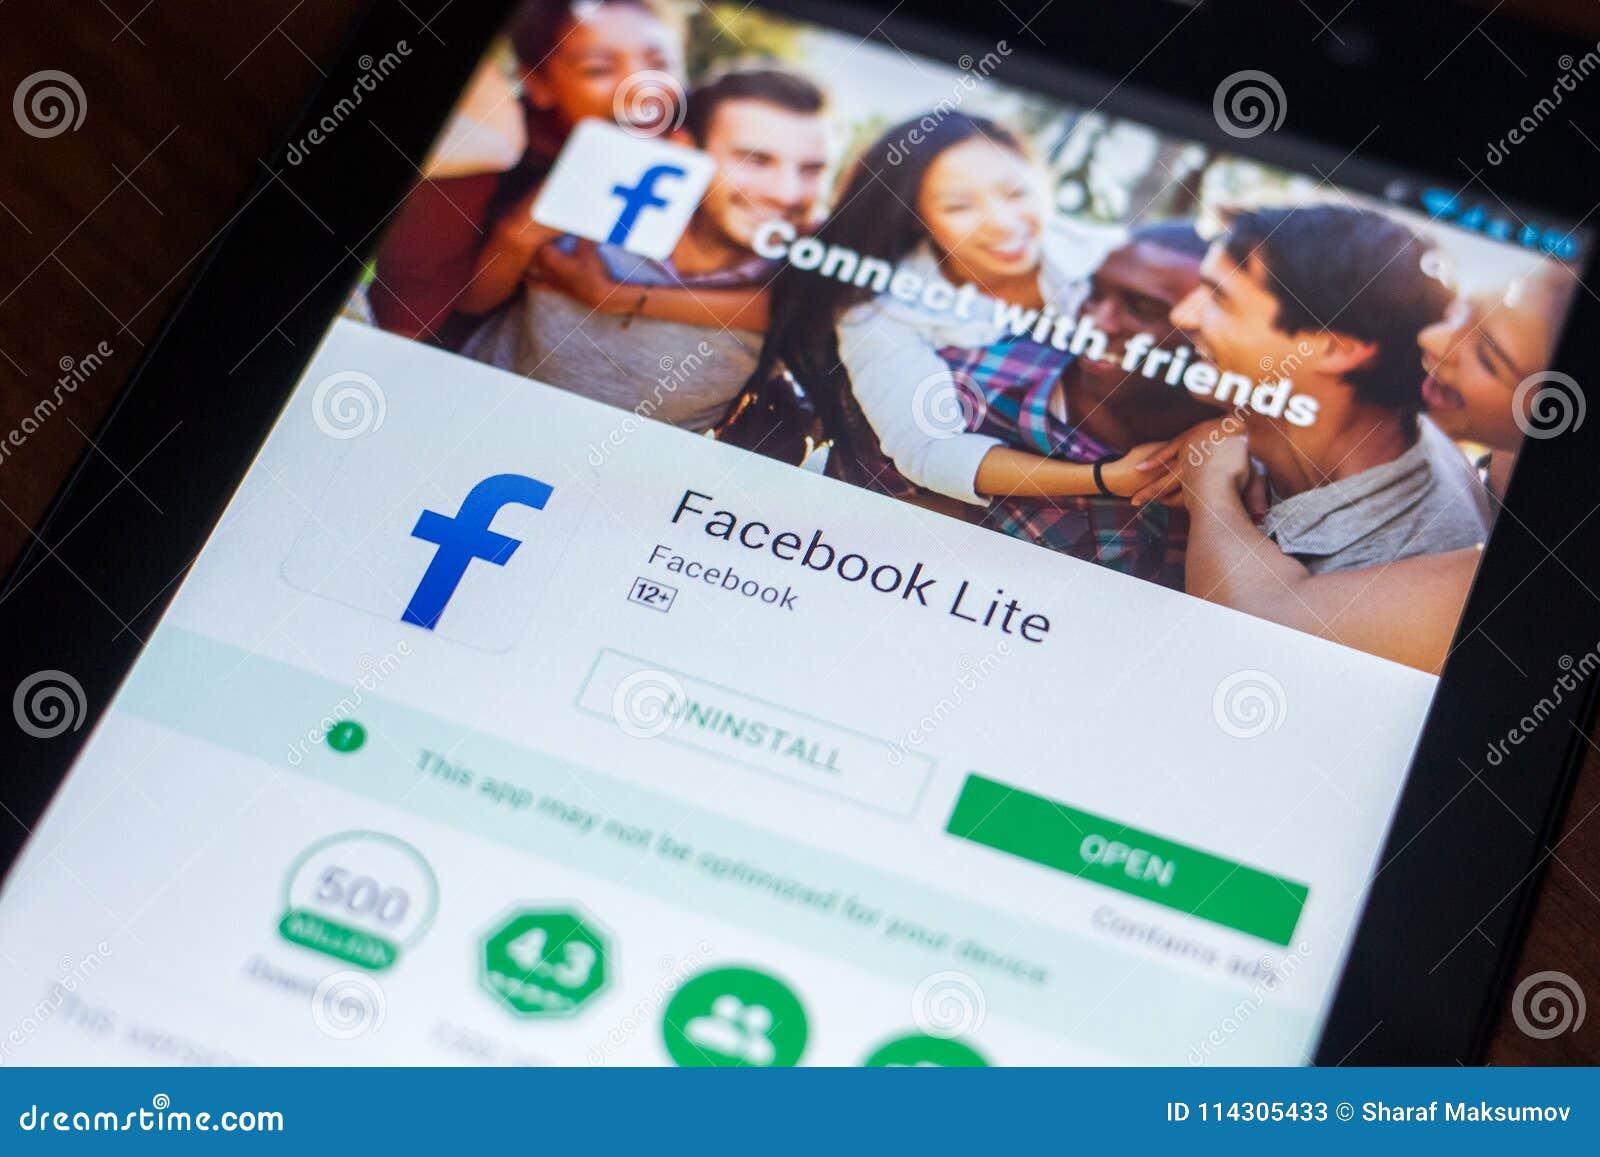 Ryazan, Russia - March 21, 2018 - Facebook Lite Mobile App